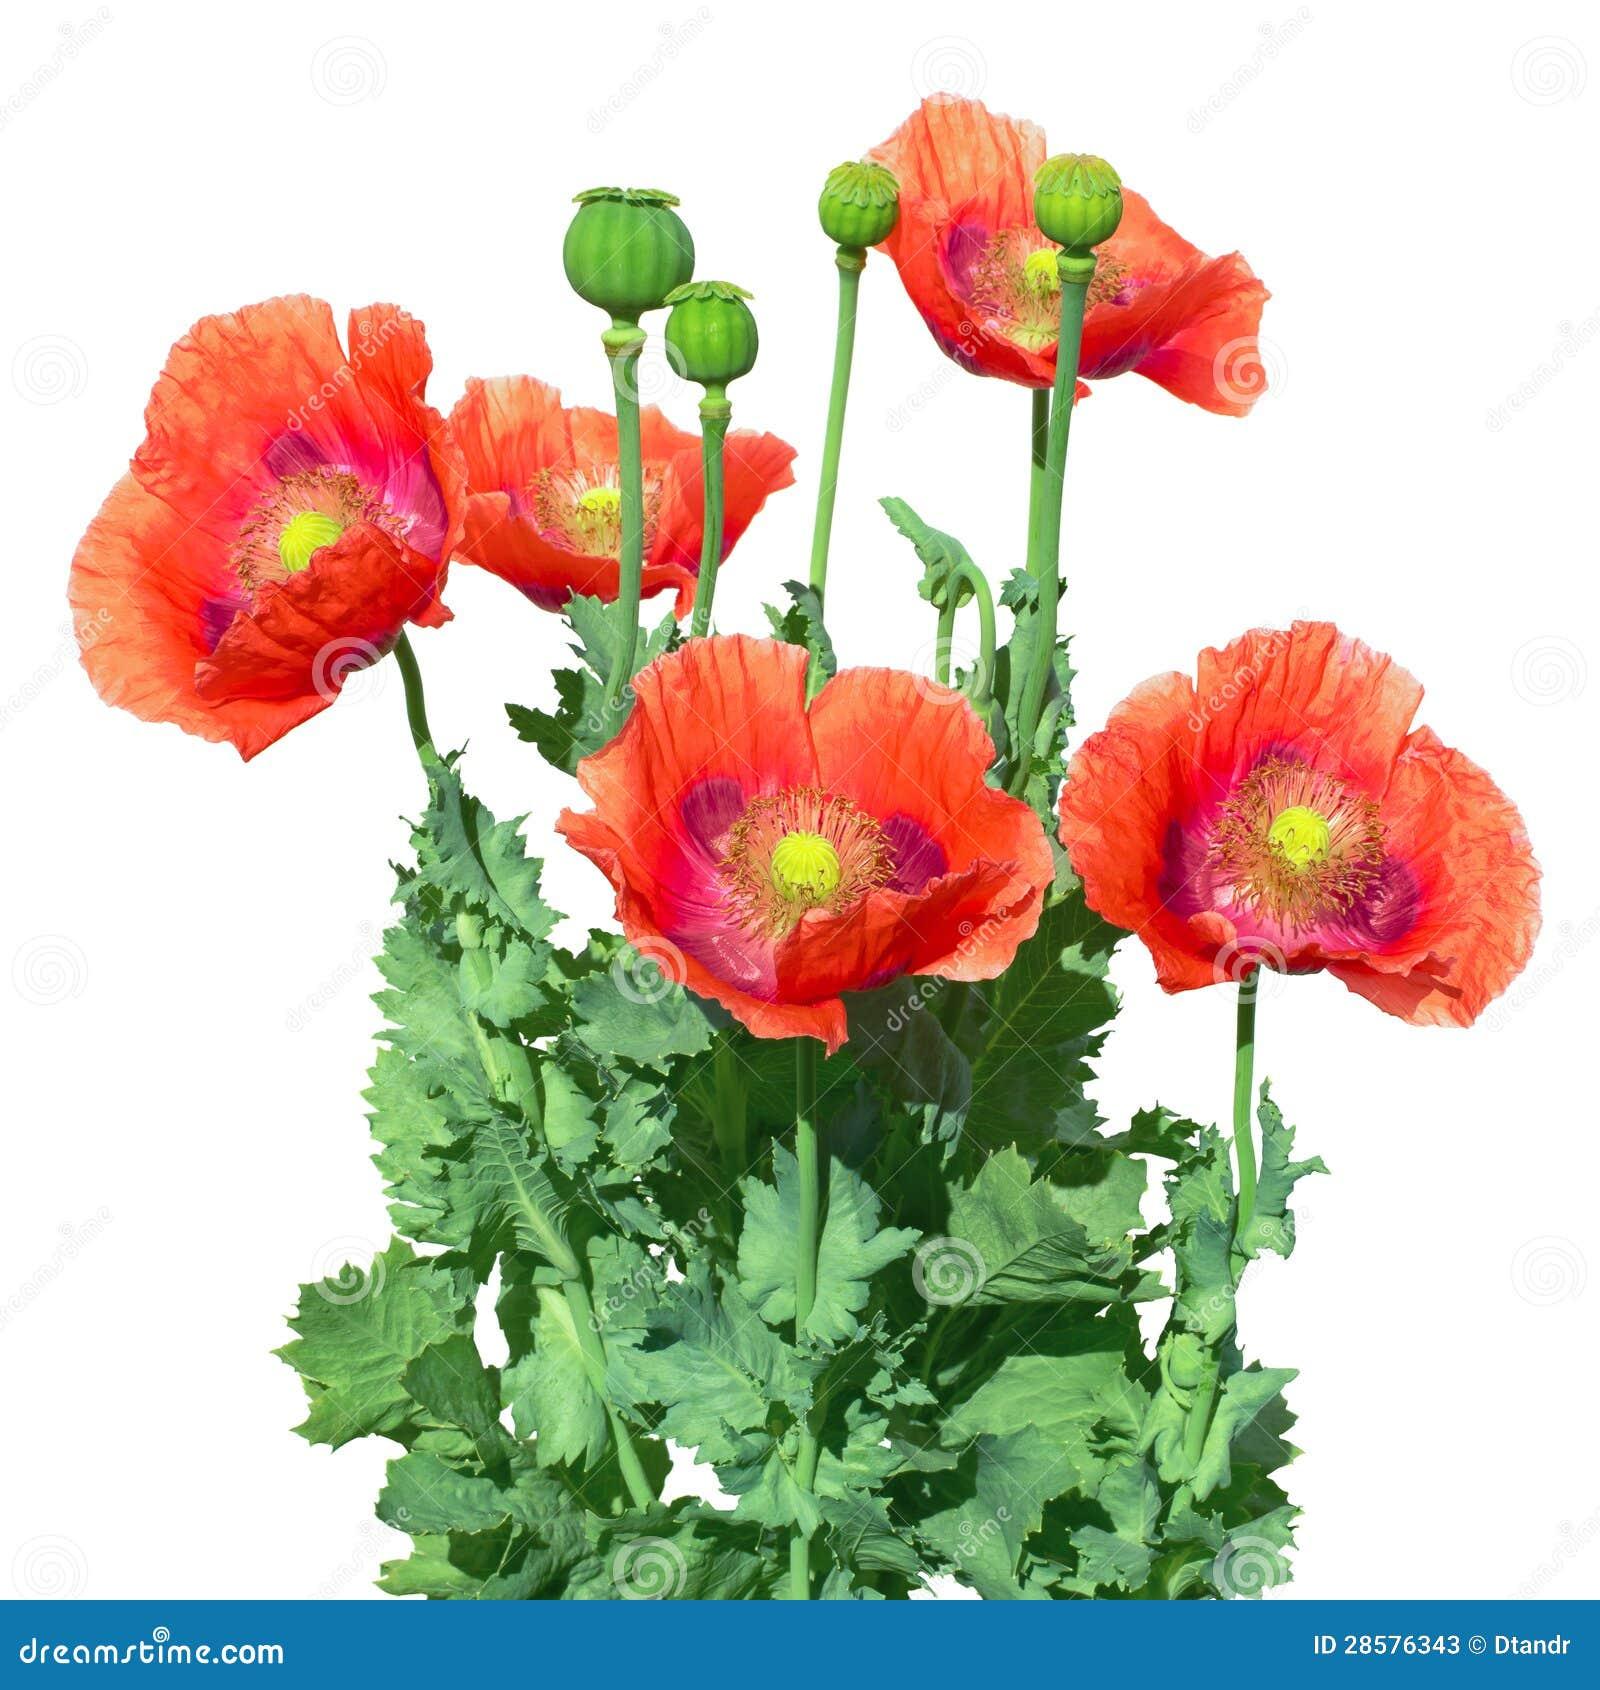 Opium Poppy The Papaver Somniferum Stock Image Image Of Capsule